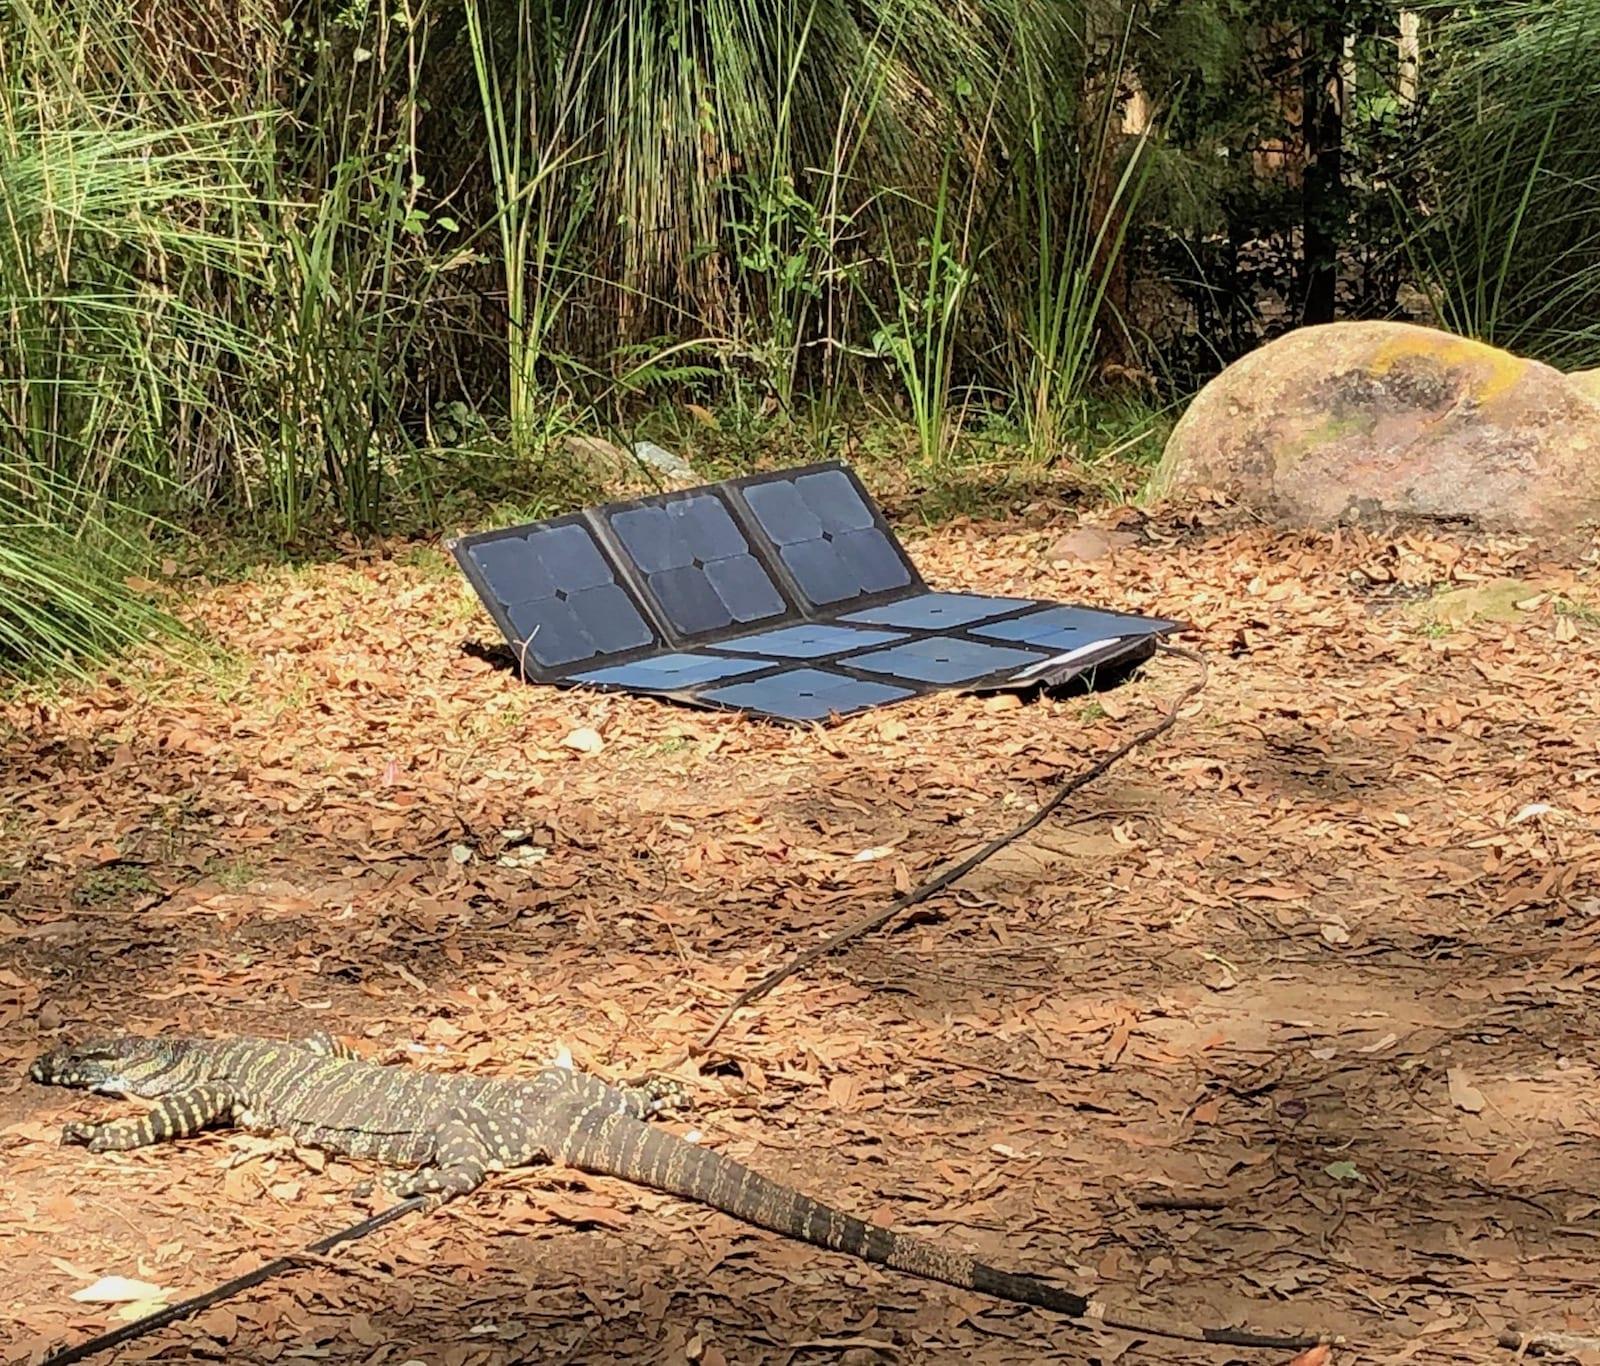 Our REDARC solar blanket with a goanna on the extension lead.